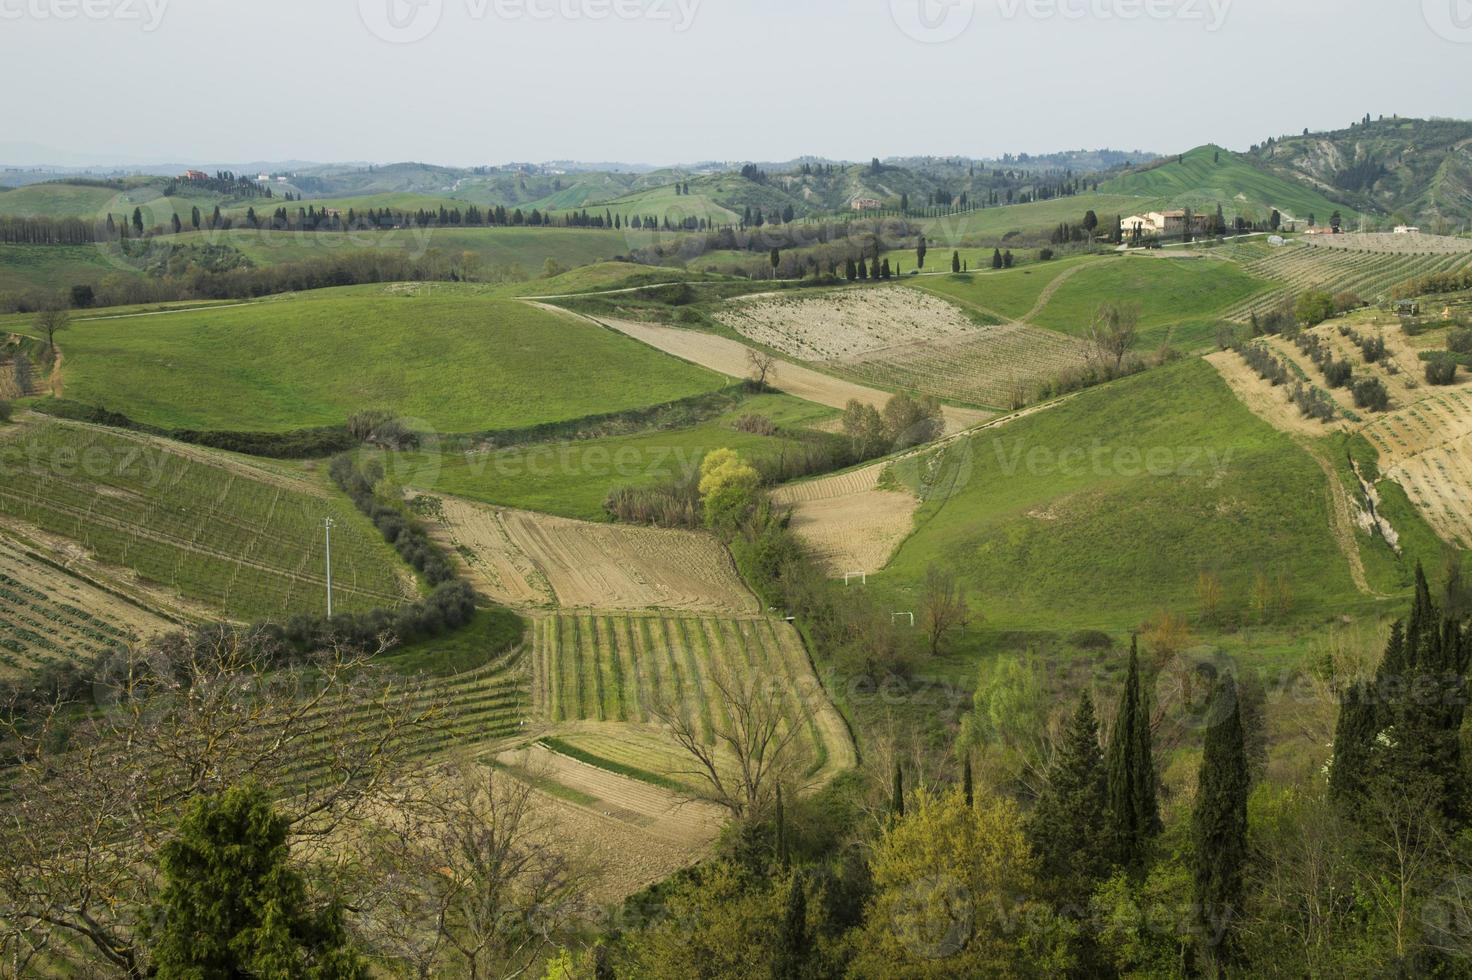 Panorama colline toscane, certaldo, florence photo